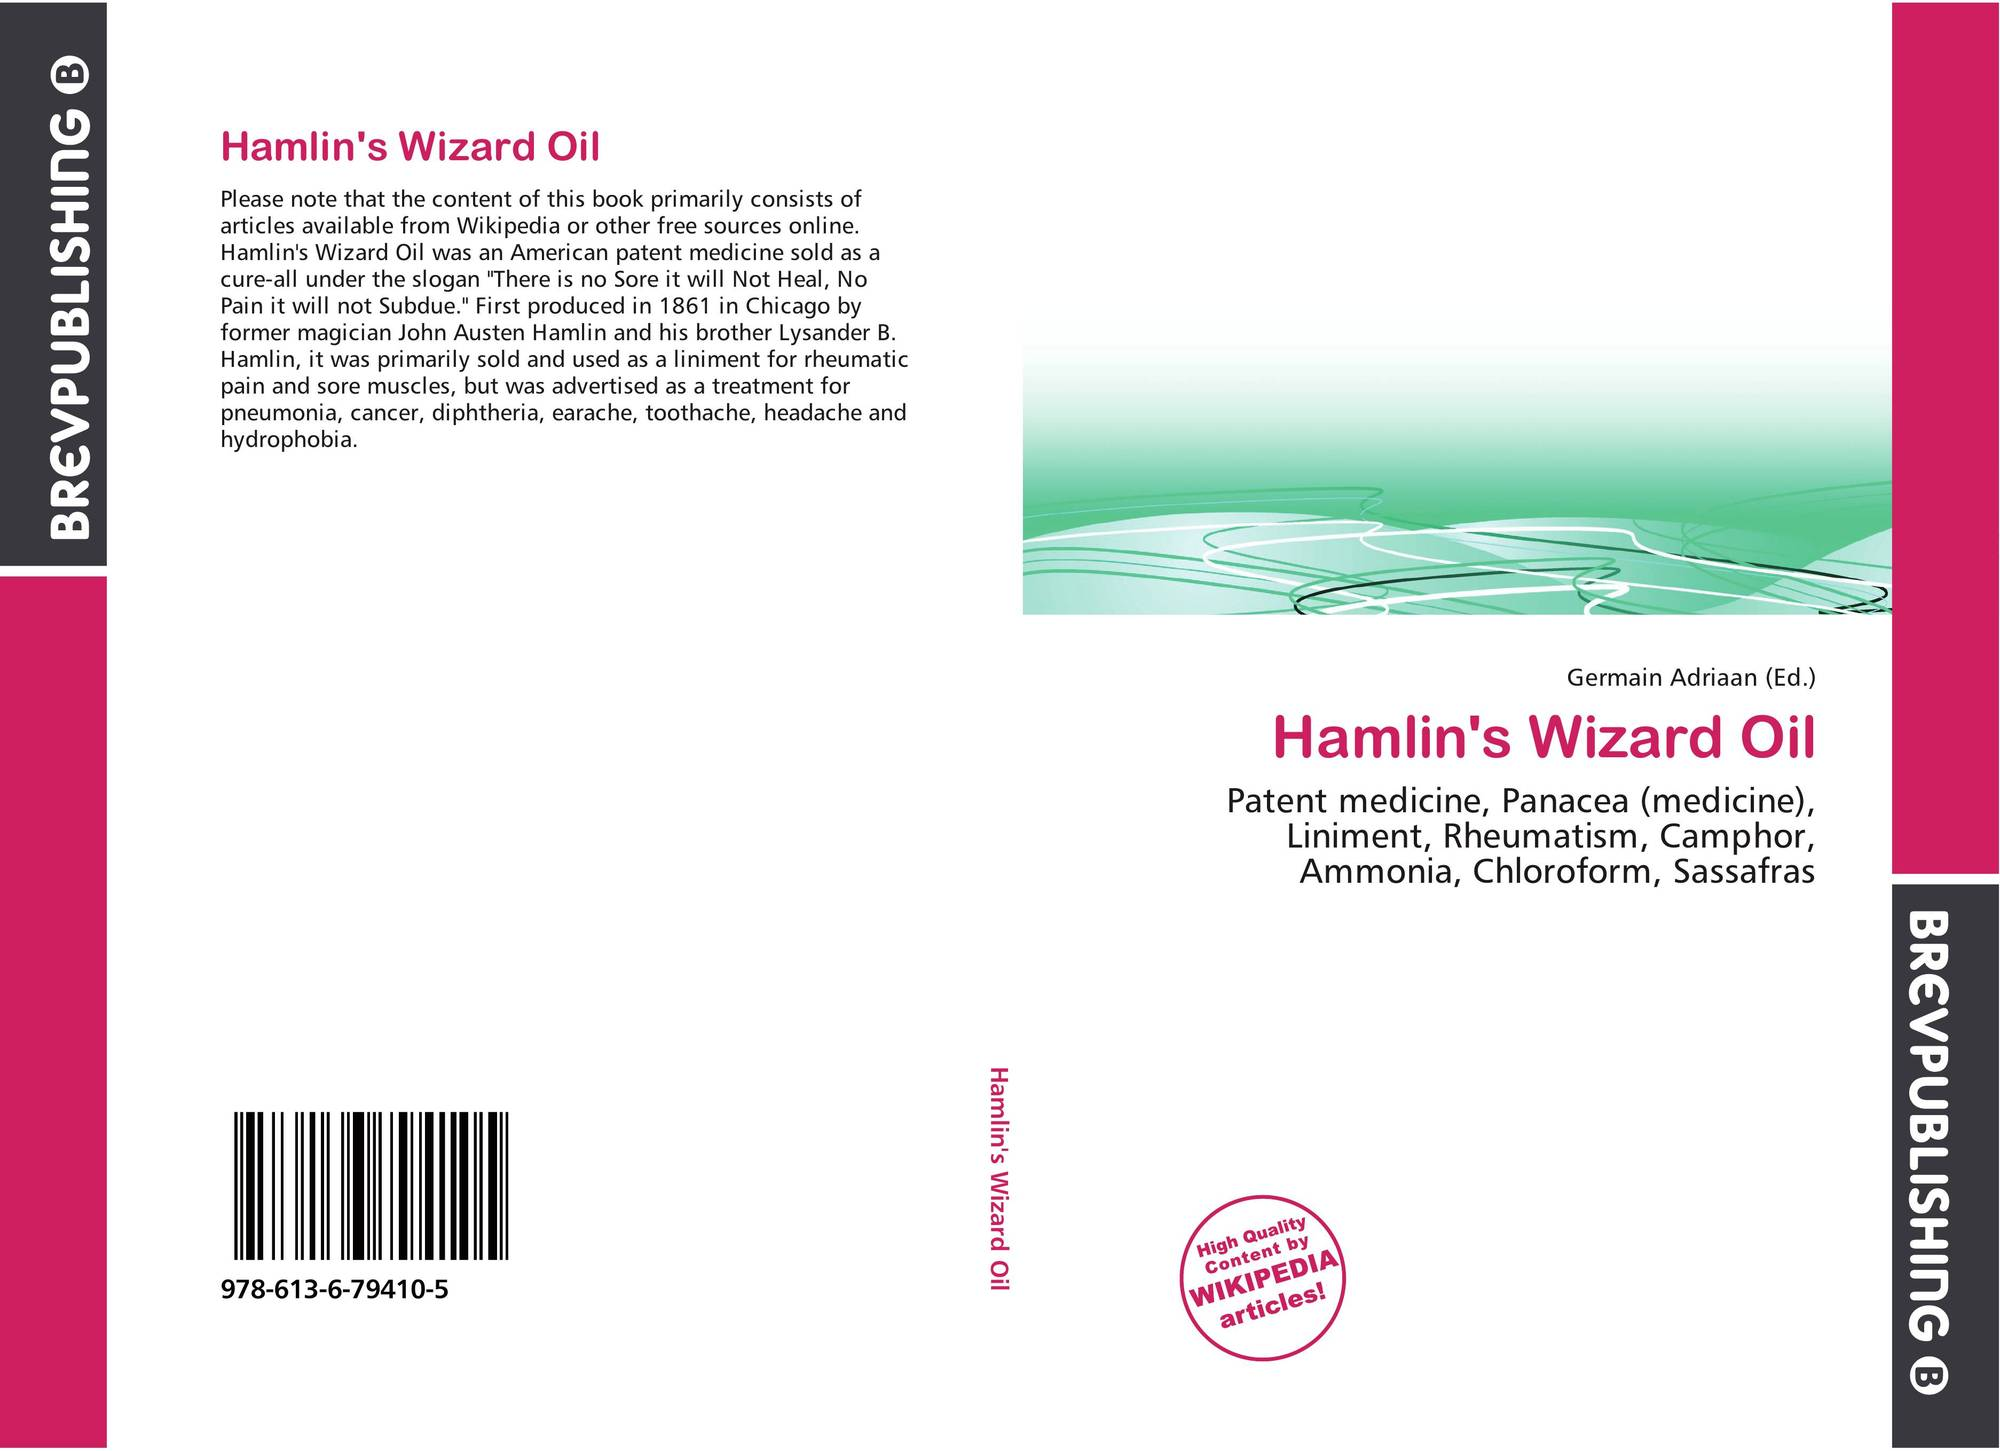 Hamlin's Wizard Oil, 978-613-6-79410-5, 6136794101